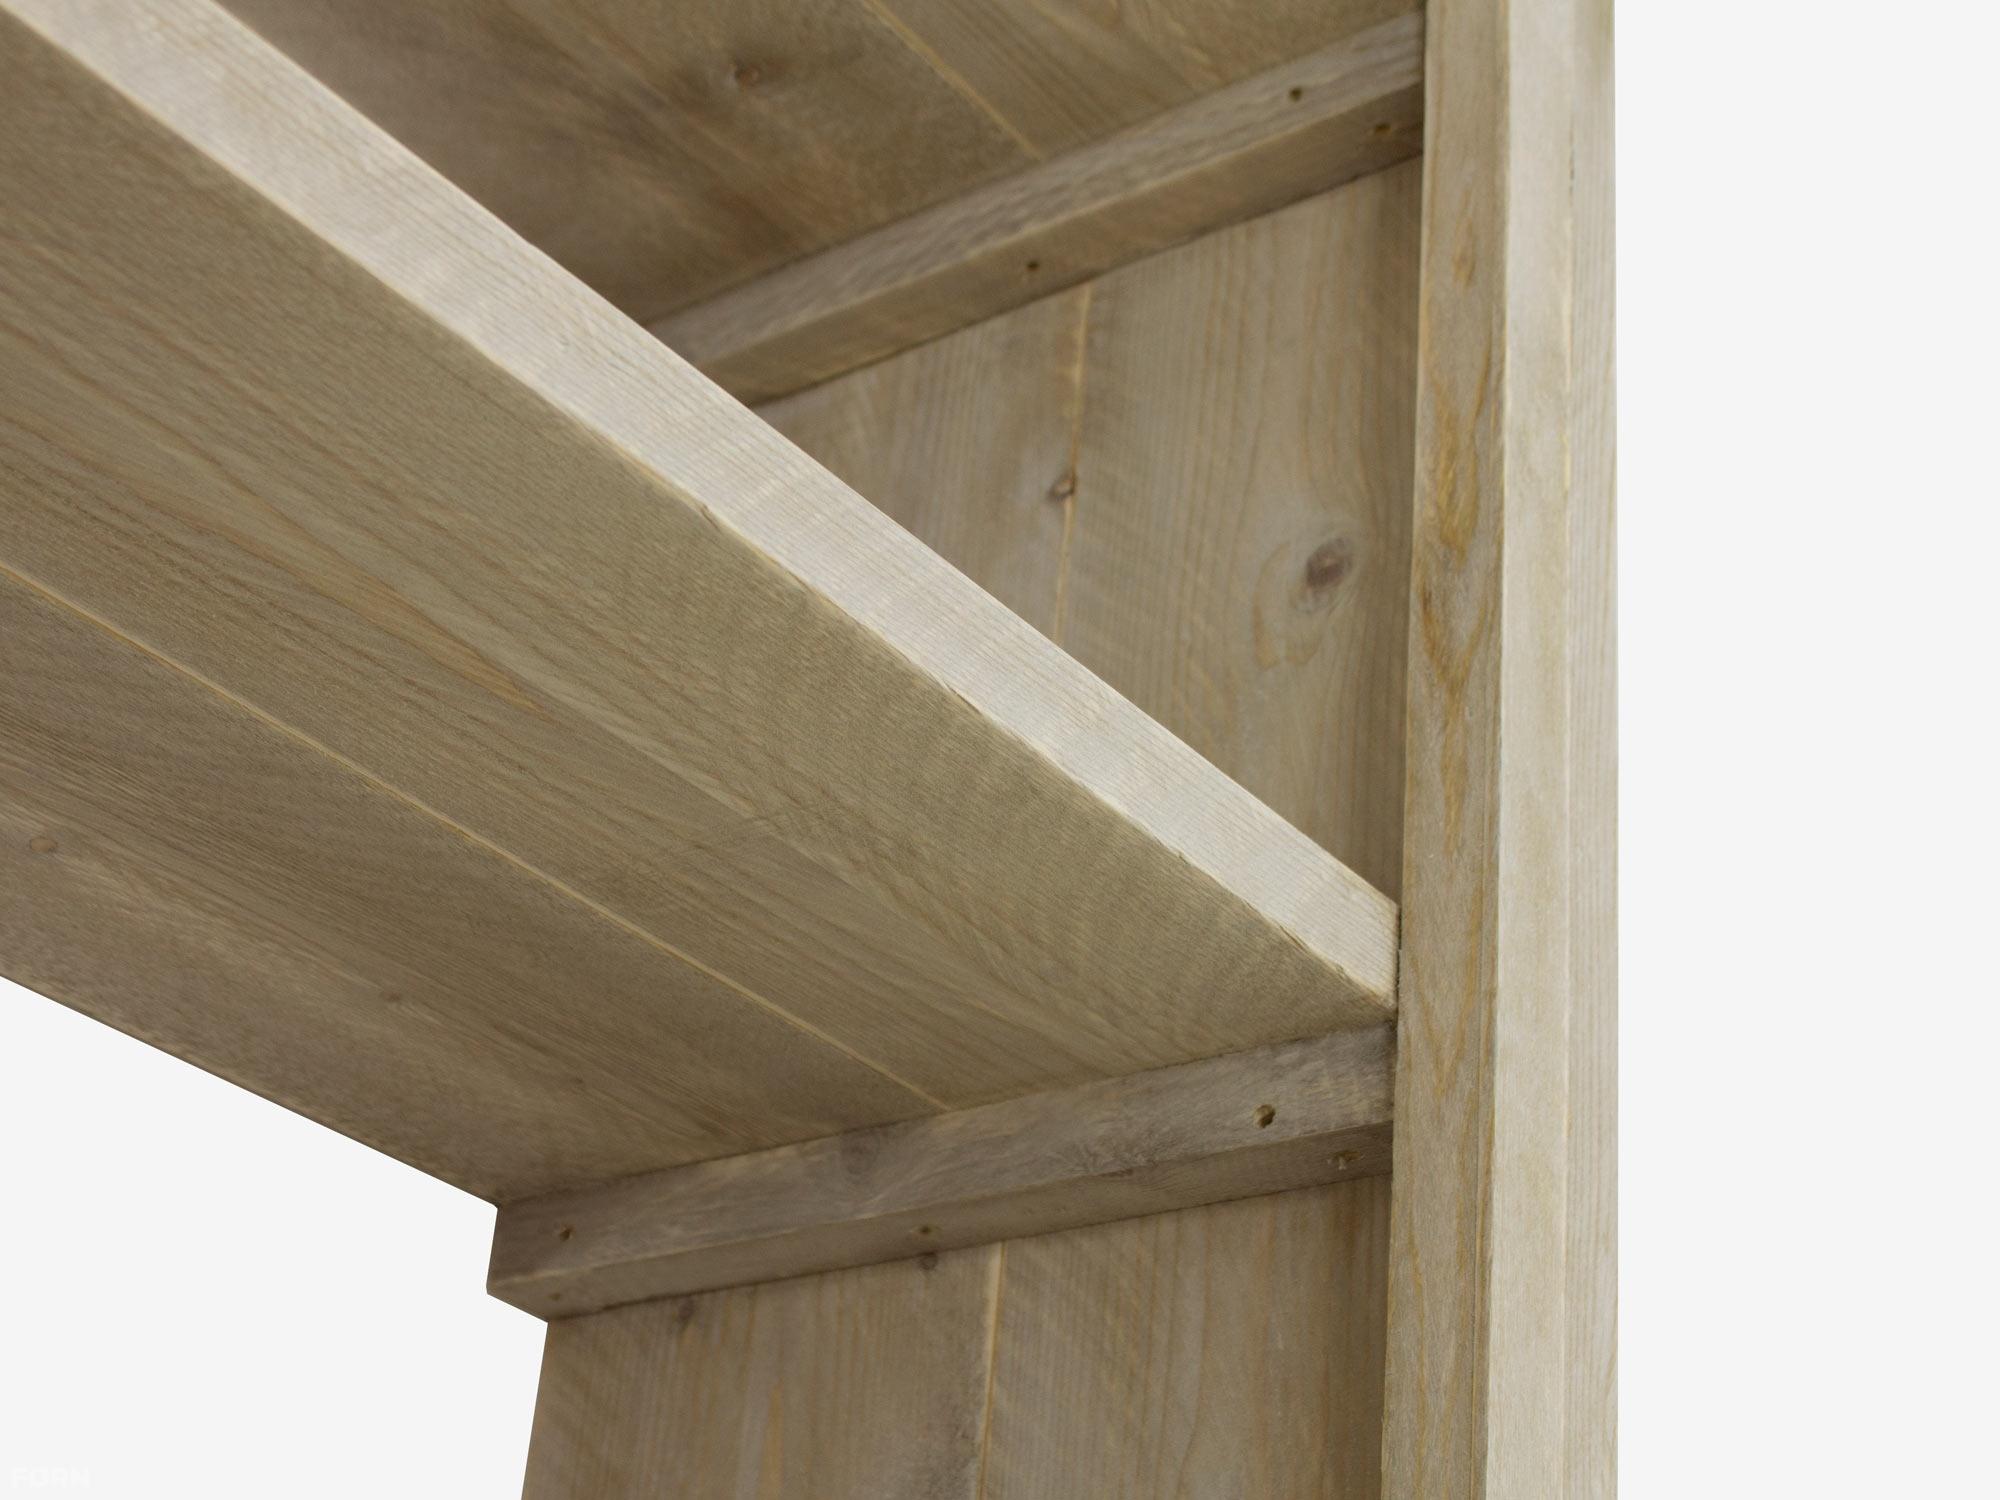 Robuuste steigerhouten boekenkast - Binnen twee weken geleverd